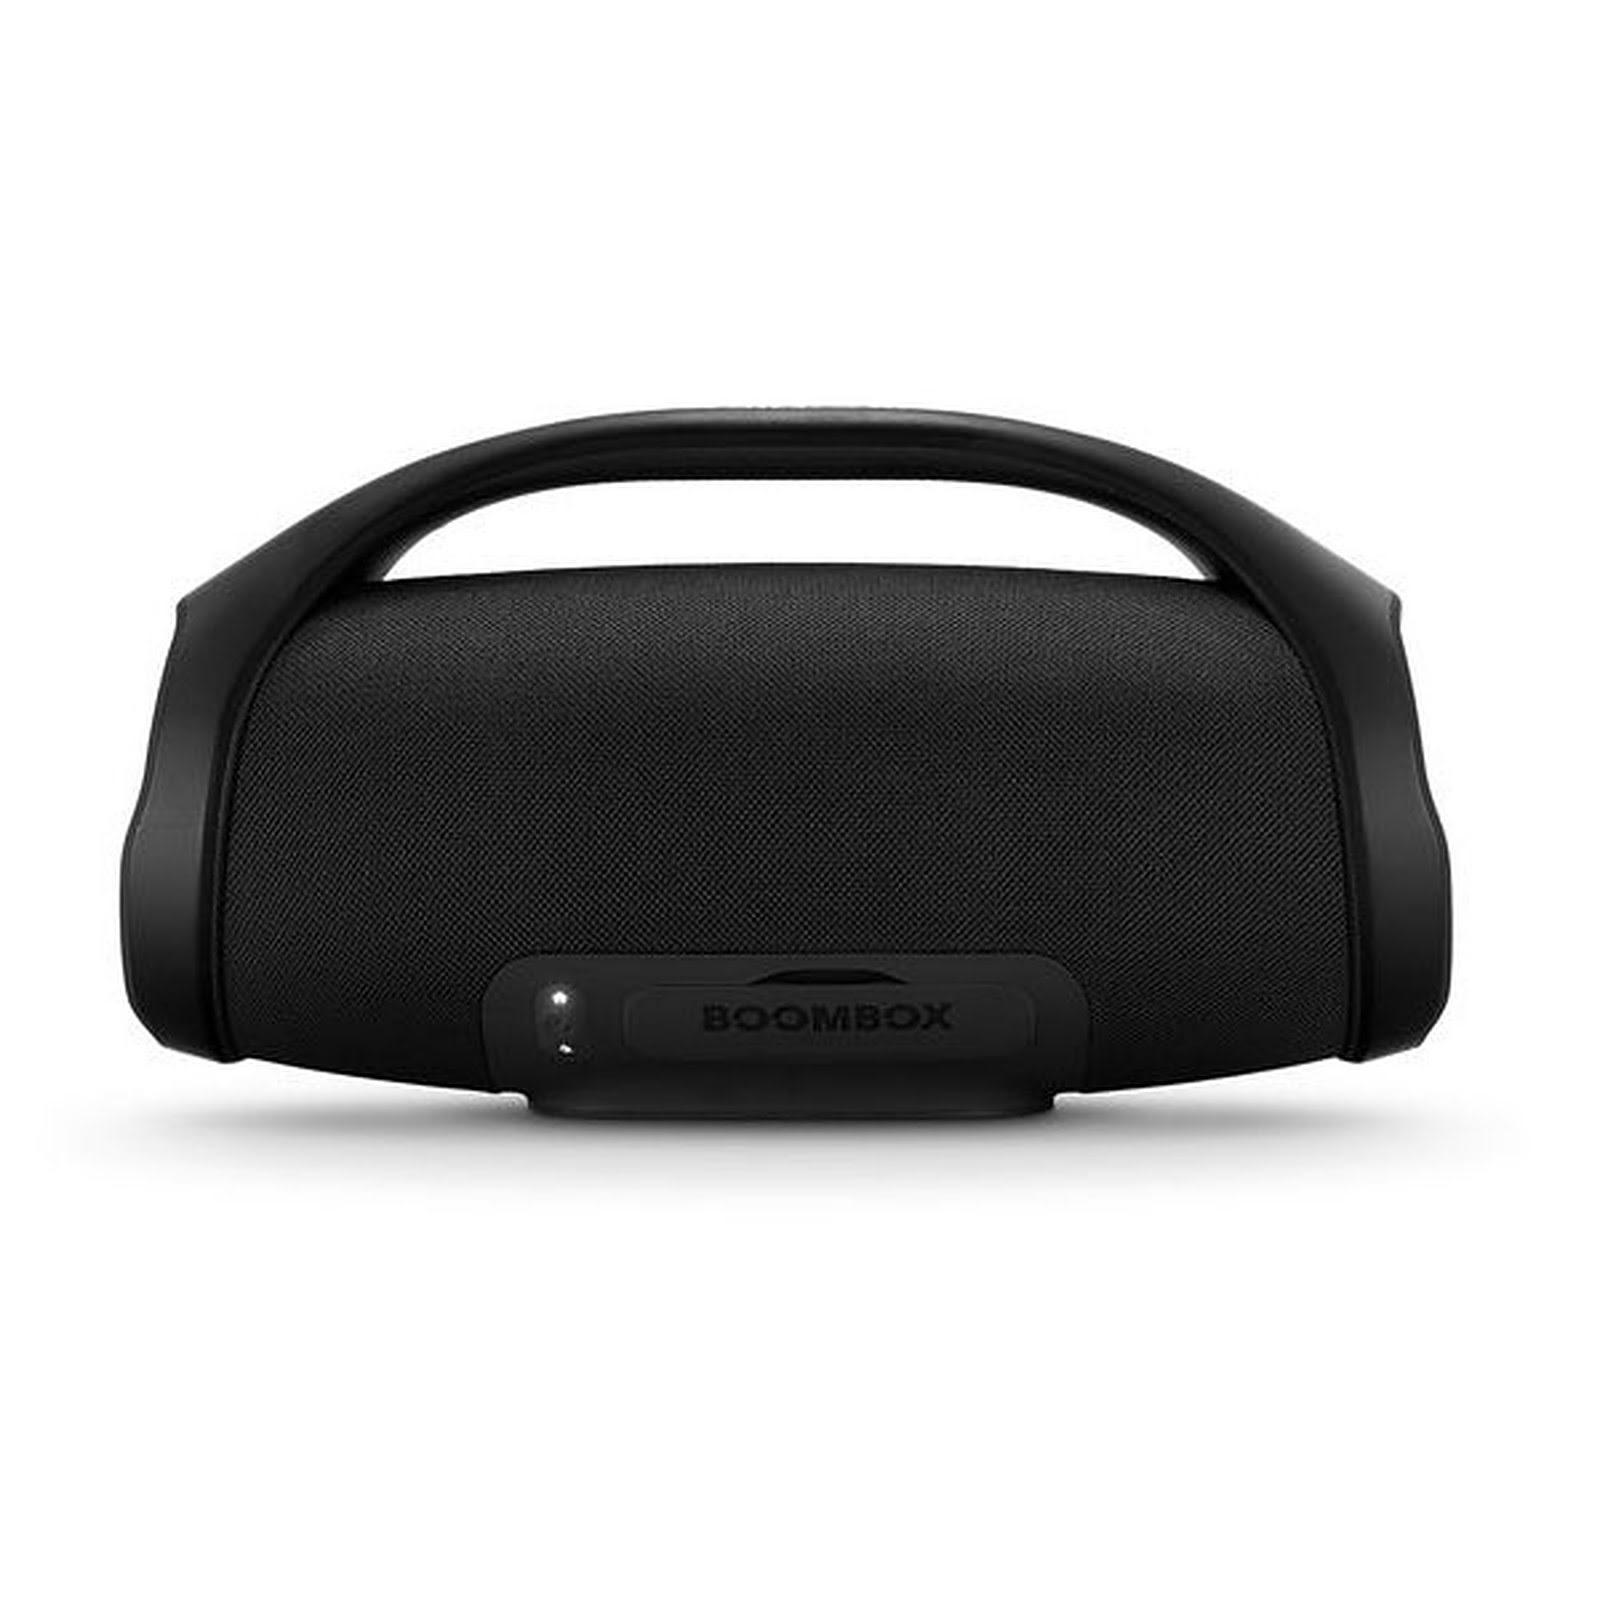 Boombox - Noir (JBLBOOMBOXBLKEU) - Achat / Vente Enceinte PC sur Picata.fr - 2